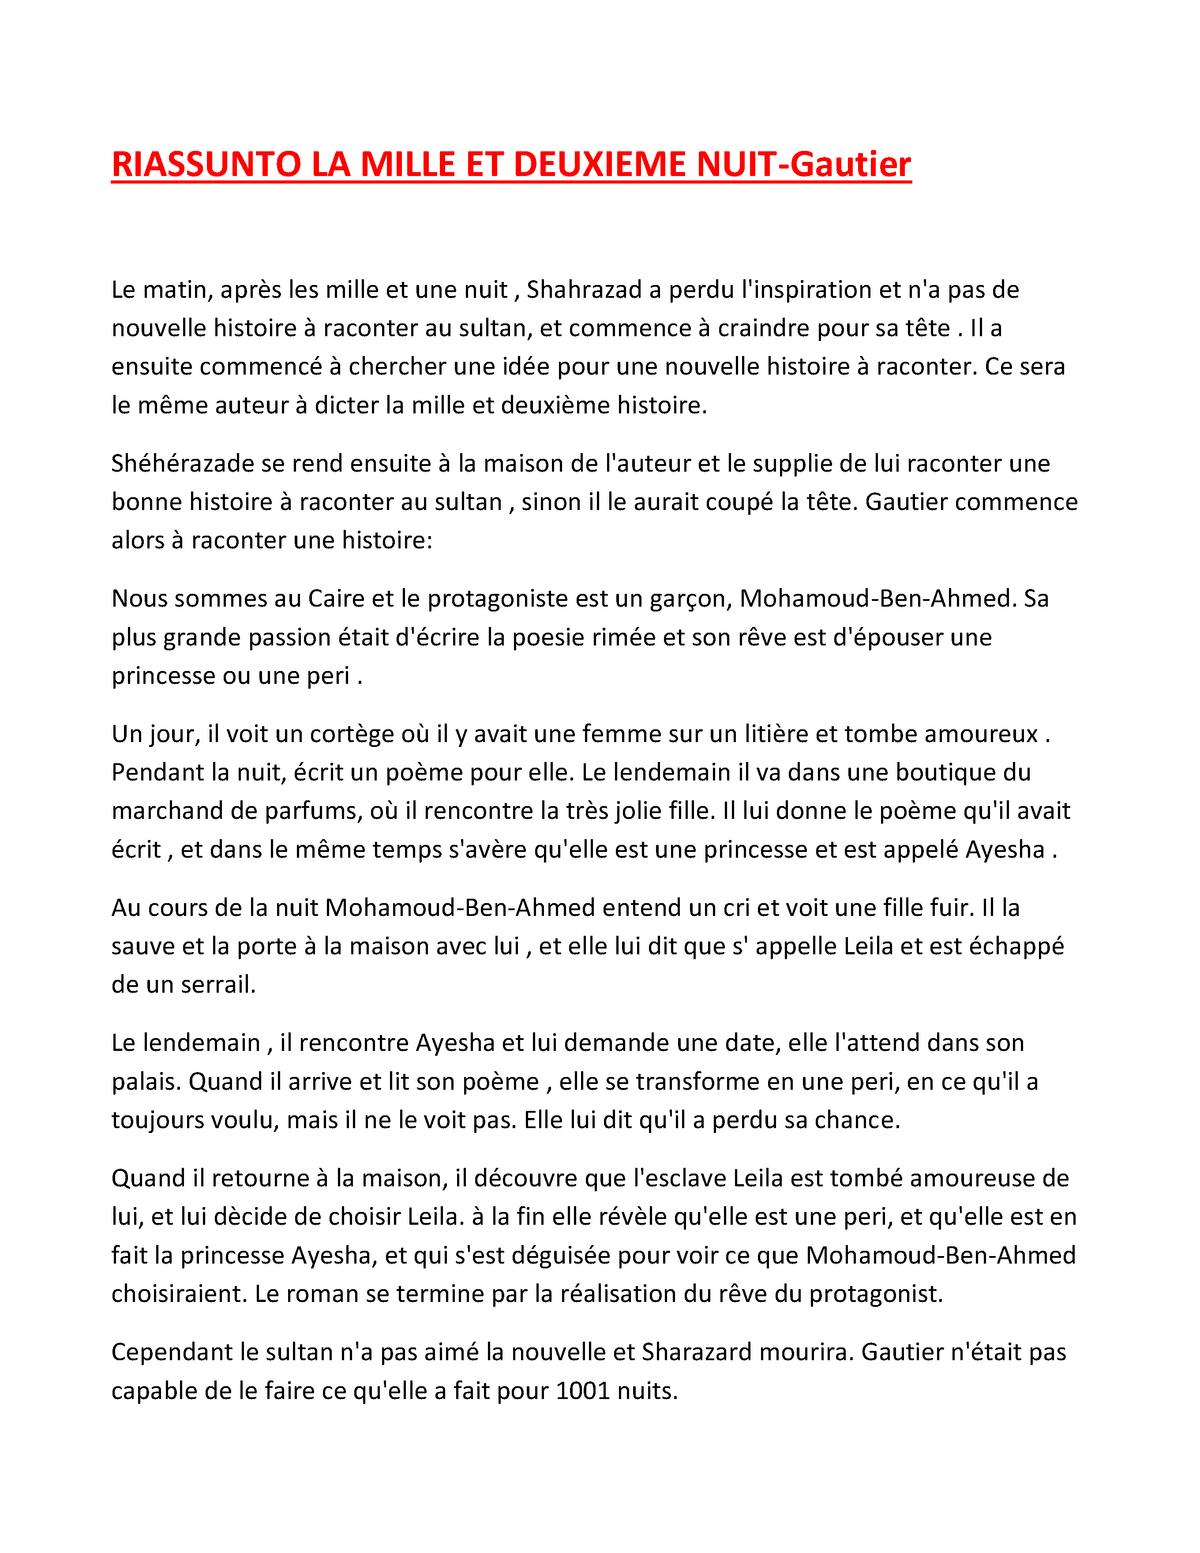 Trama Libro La Mille Et Deuxieme Nuit Studocu